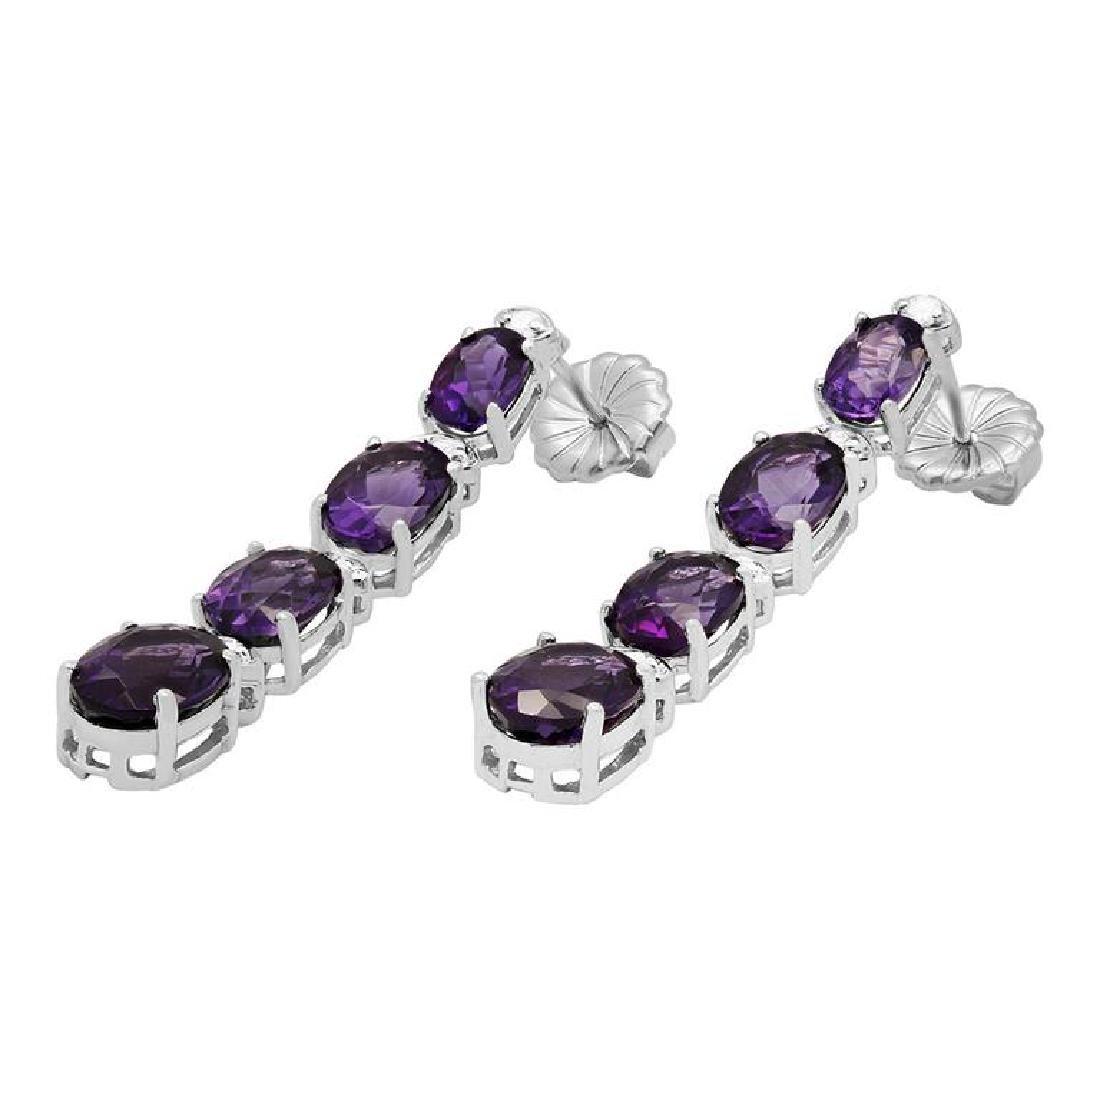 14k White Gold 6.38ct Amethyst 0.34ct Diamond Earrings - 2